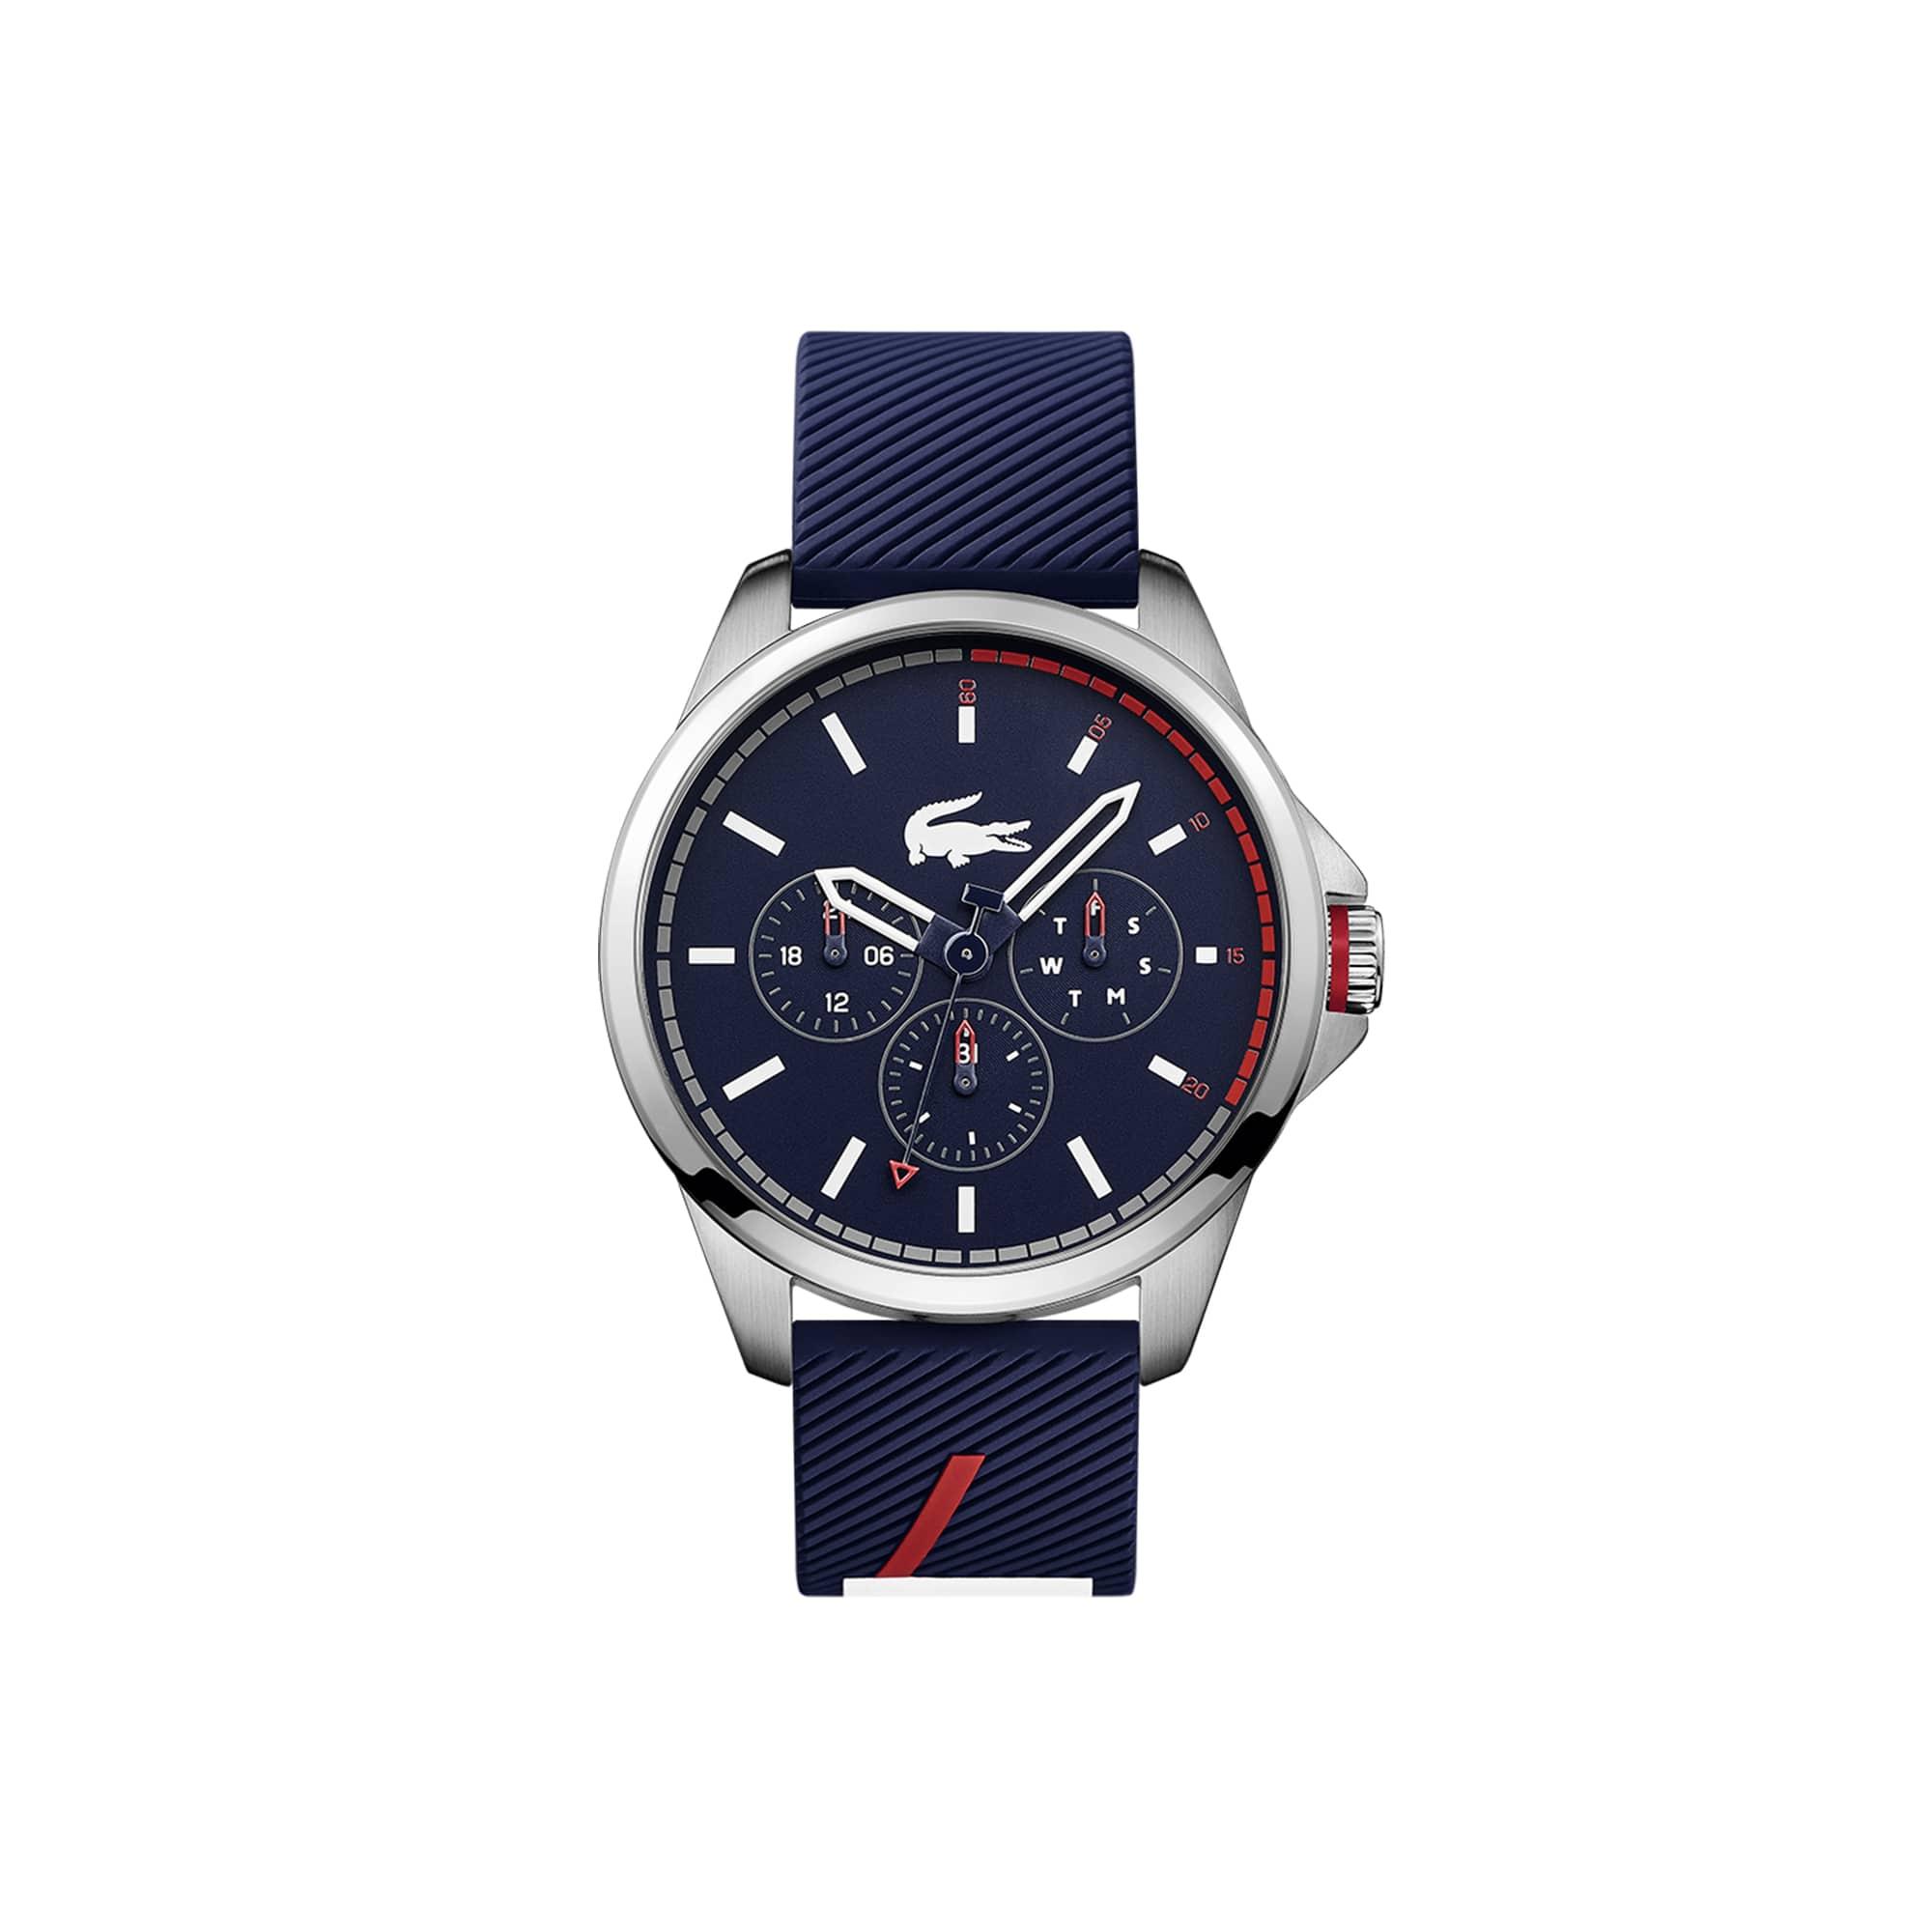 Reloj de Hombre Capbreton Multifunción con Correa de Silicona Azul